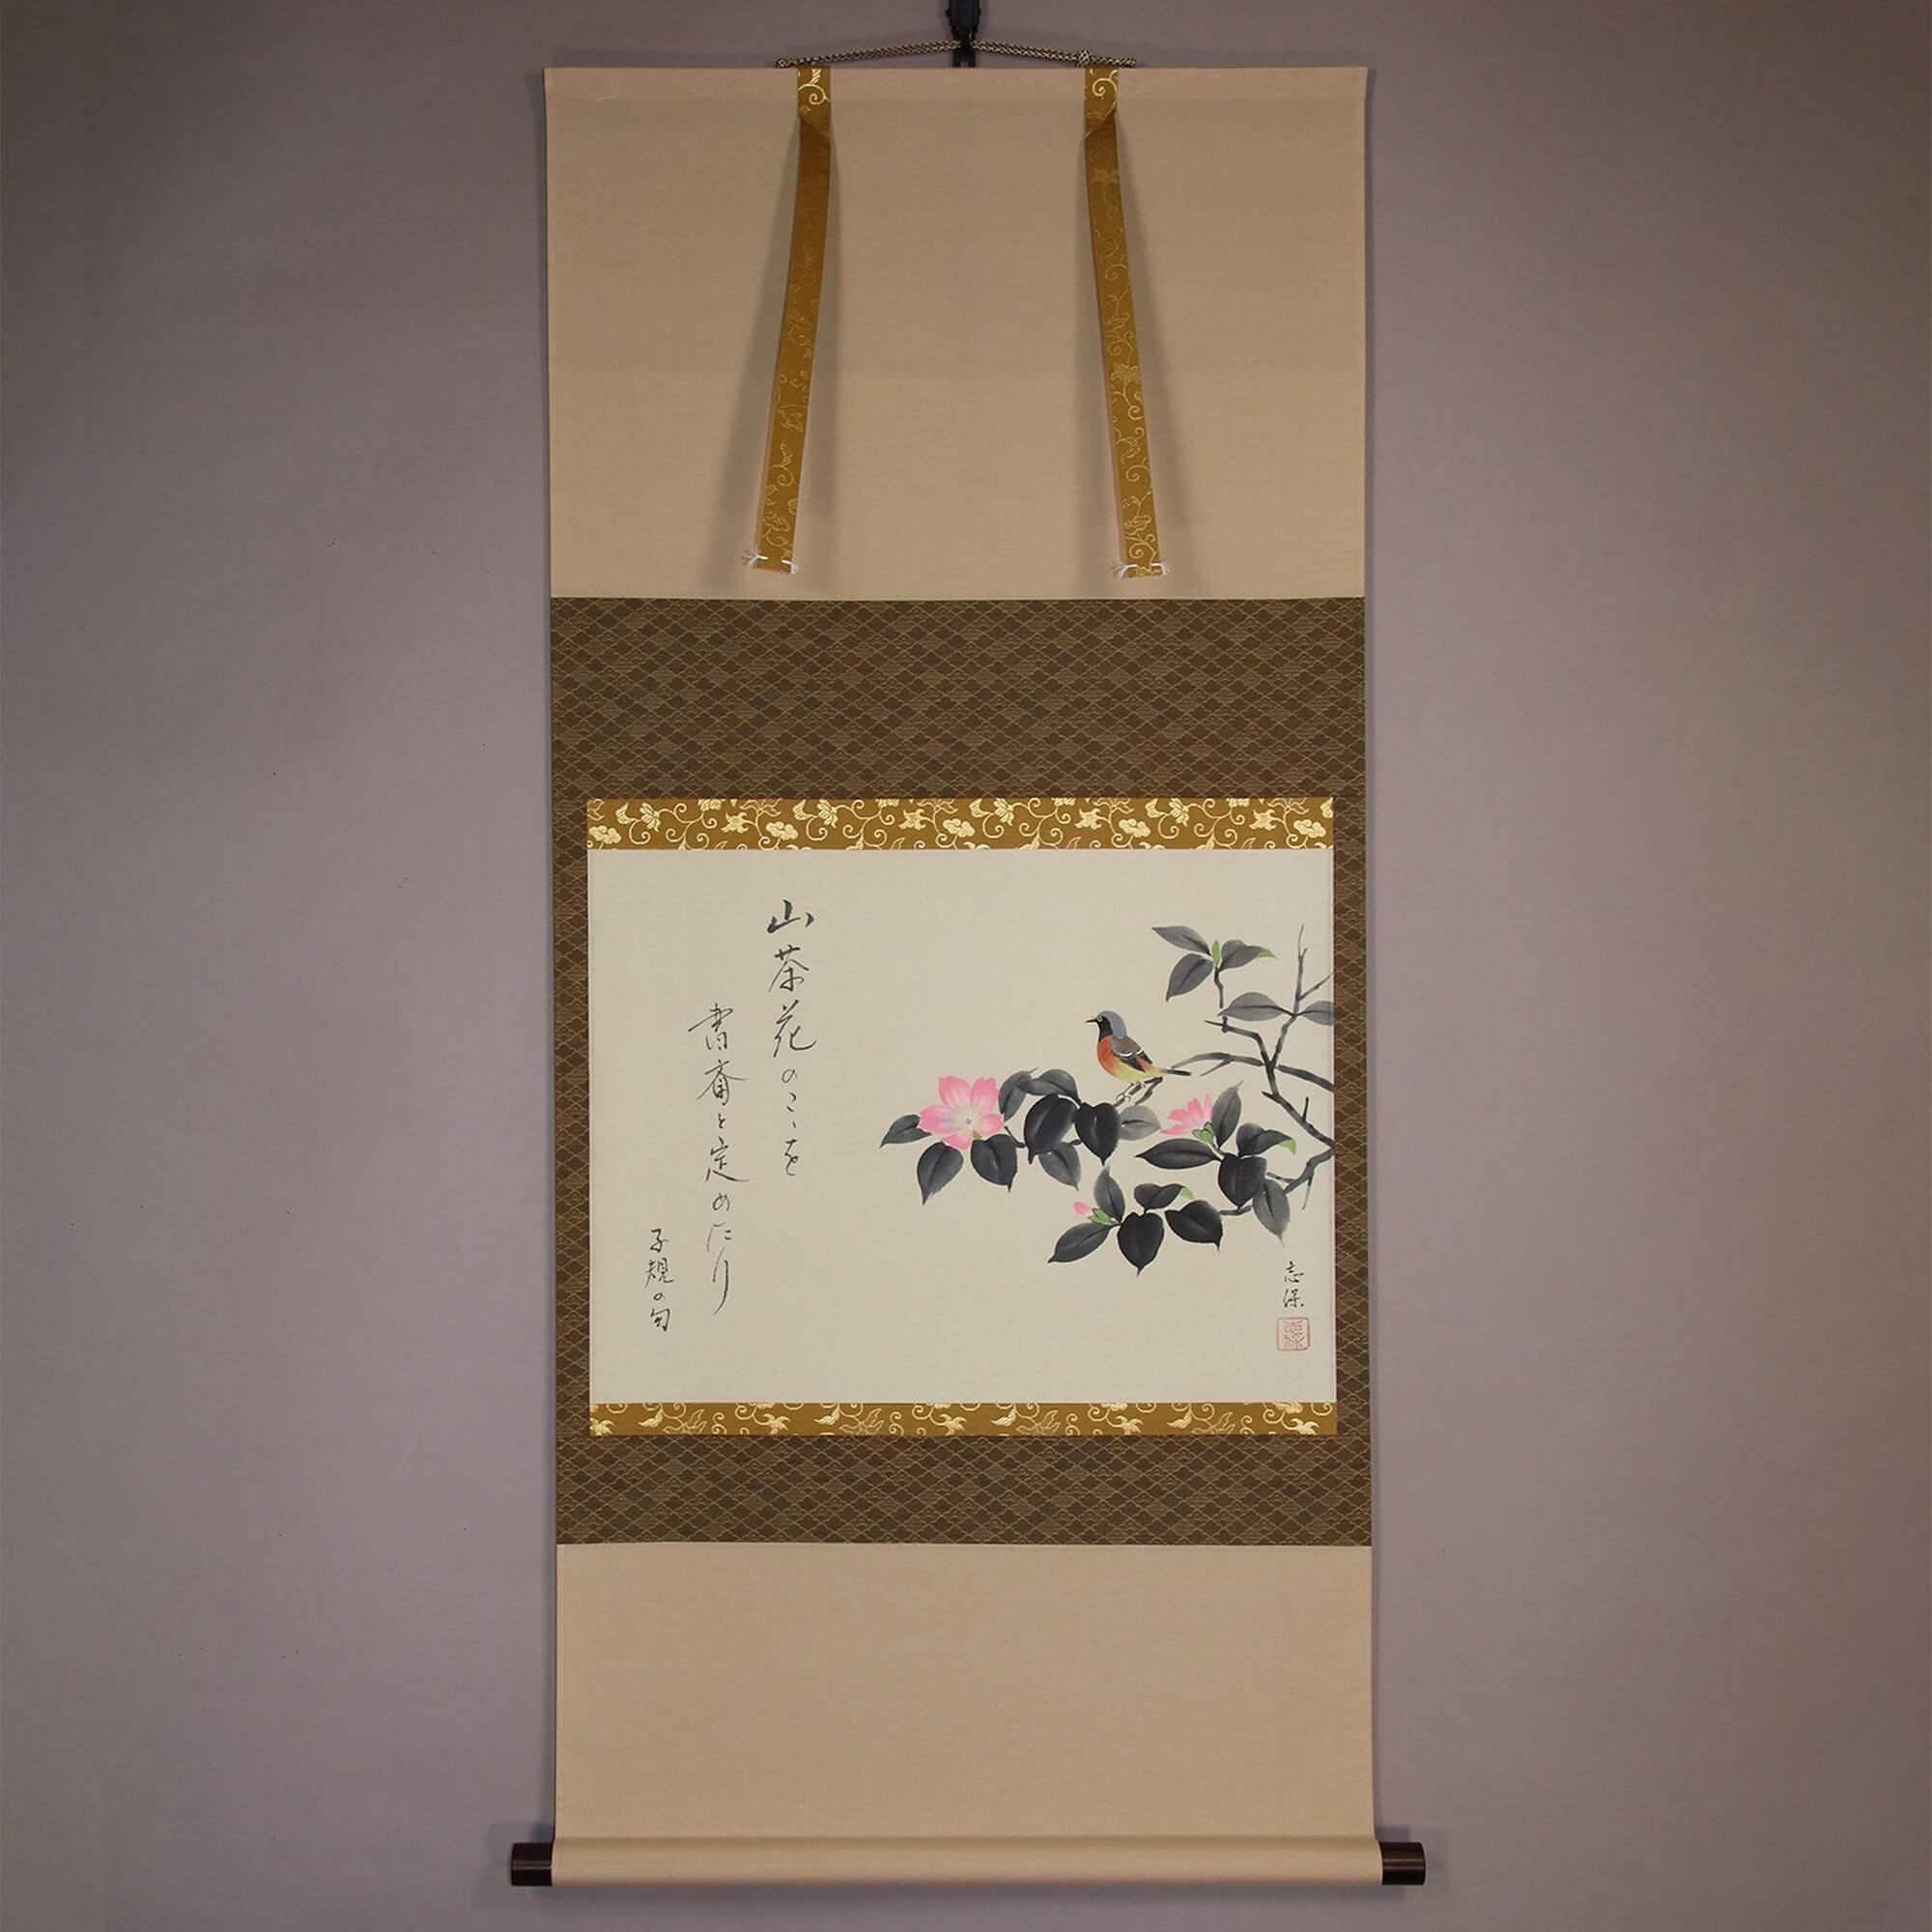 Camellia Sasanqua / Nishio Shiho